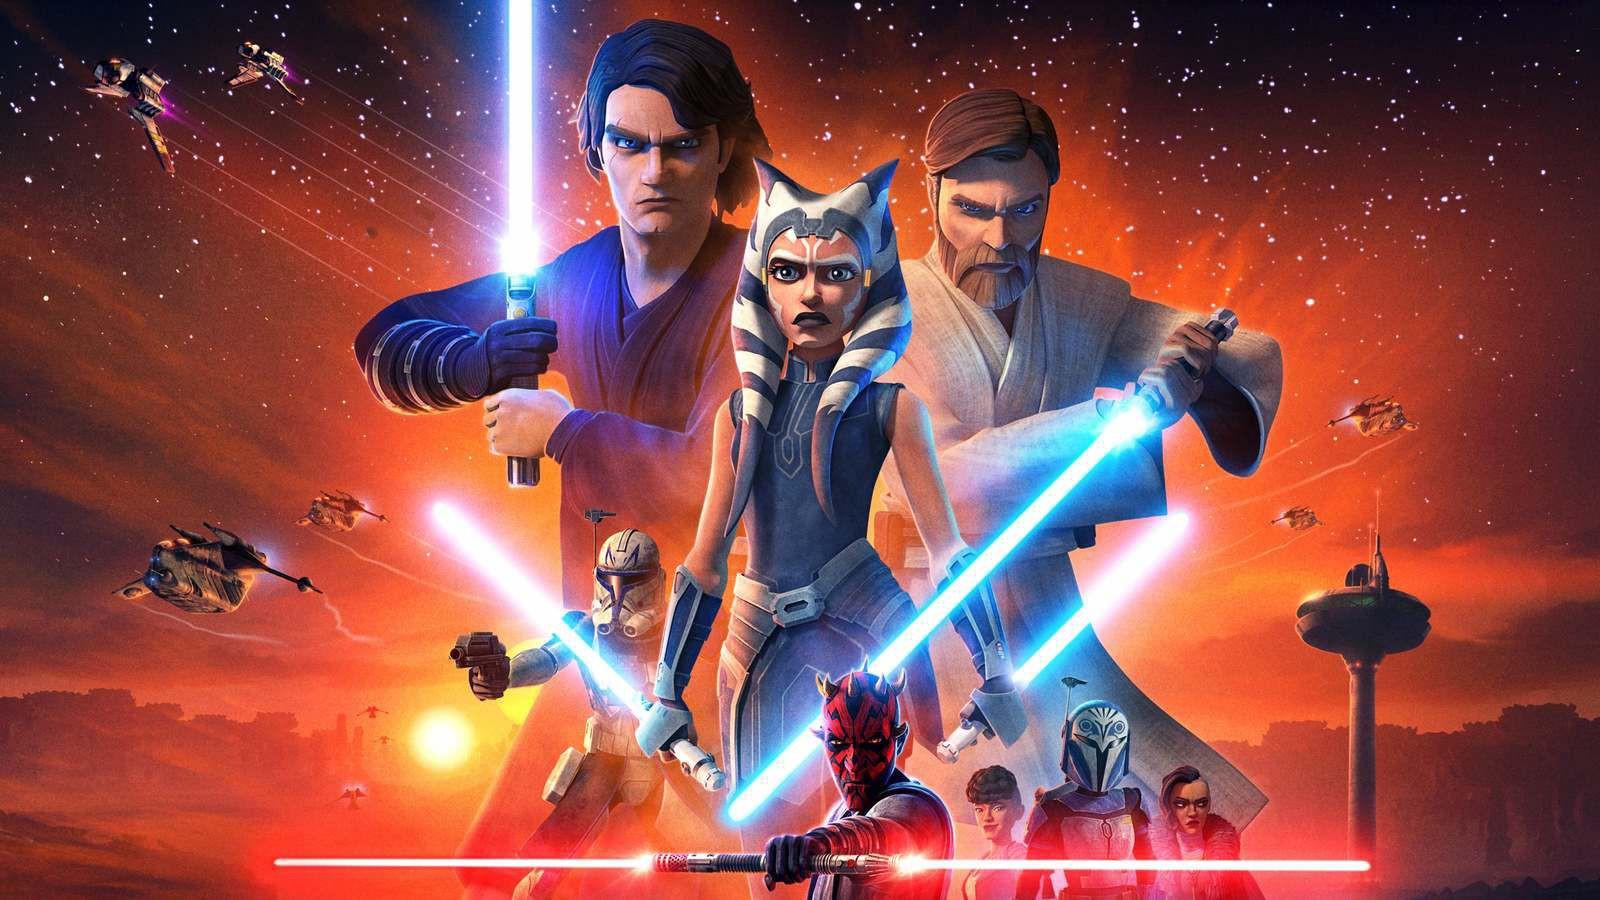 star_wars_the_clone_wars_forras_lucasfilm_disney_medium.jpg